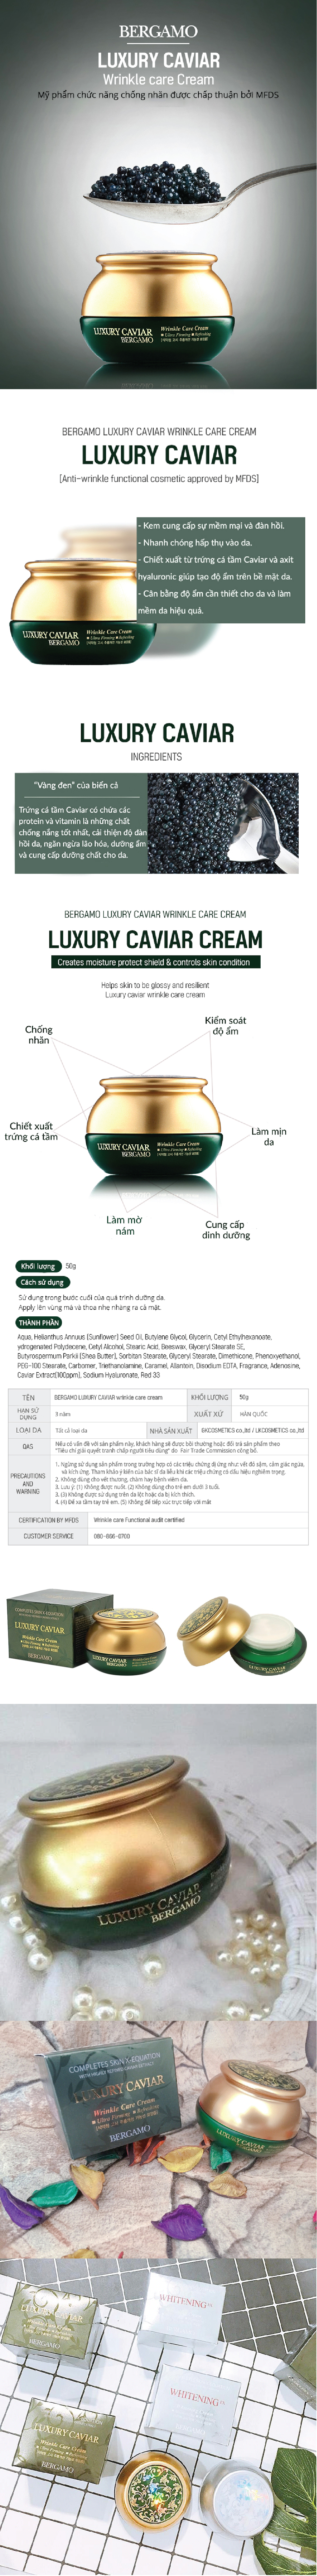 Bergamo Luxury Caviar Wrinkle Care Cream